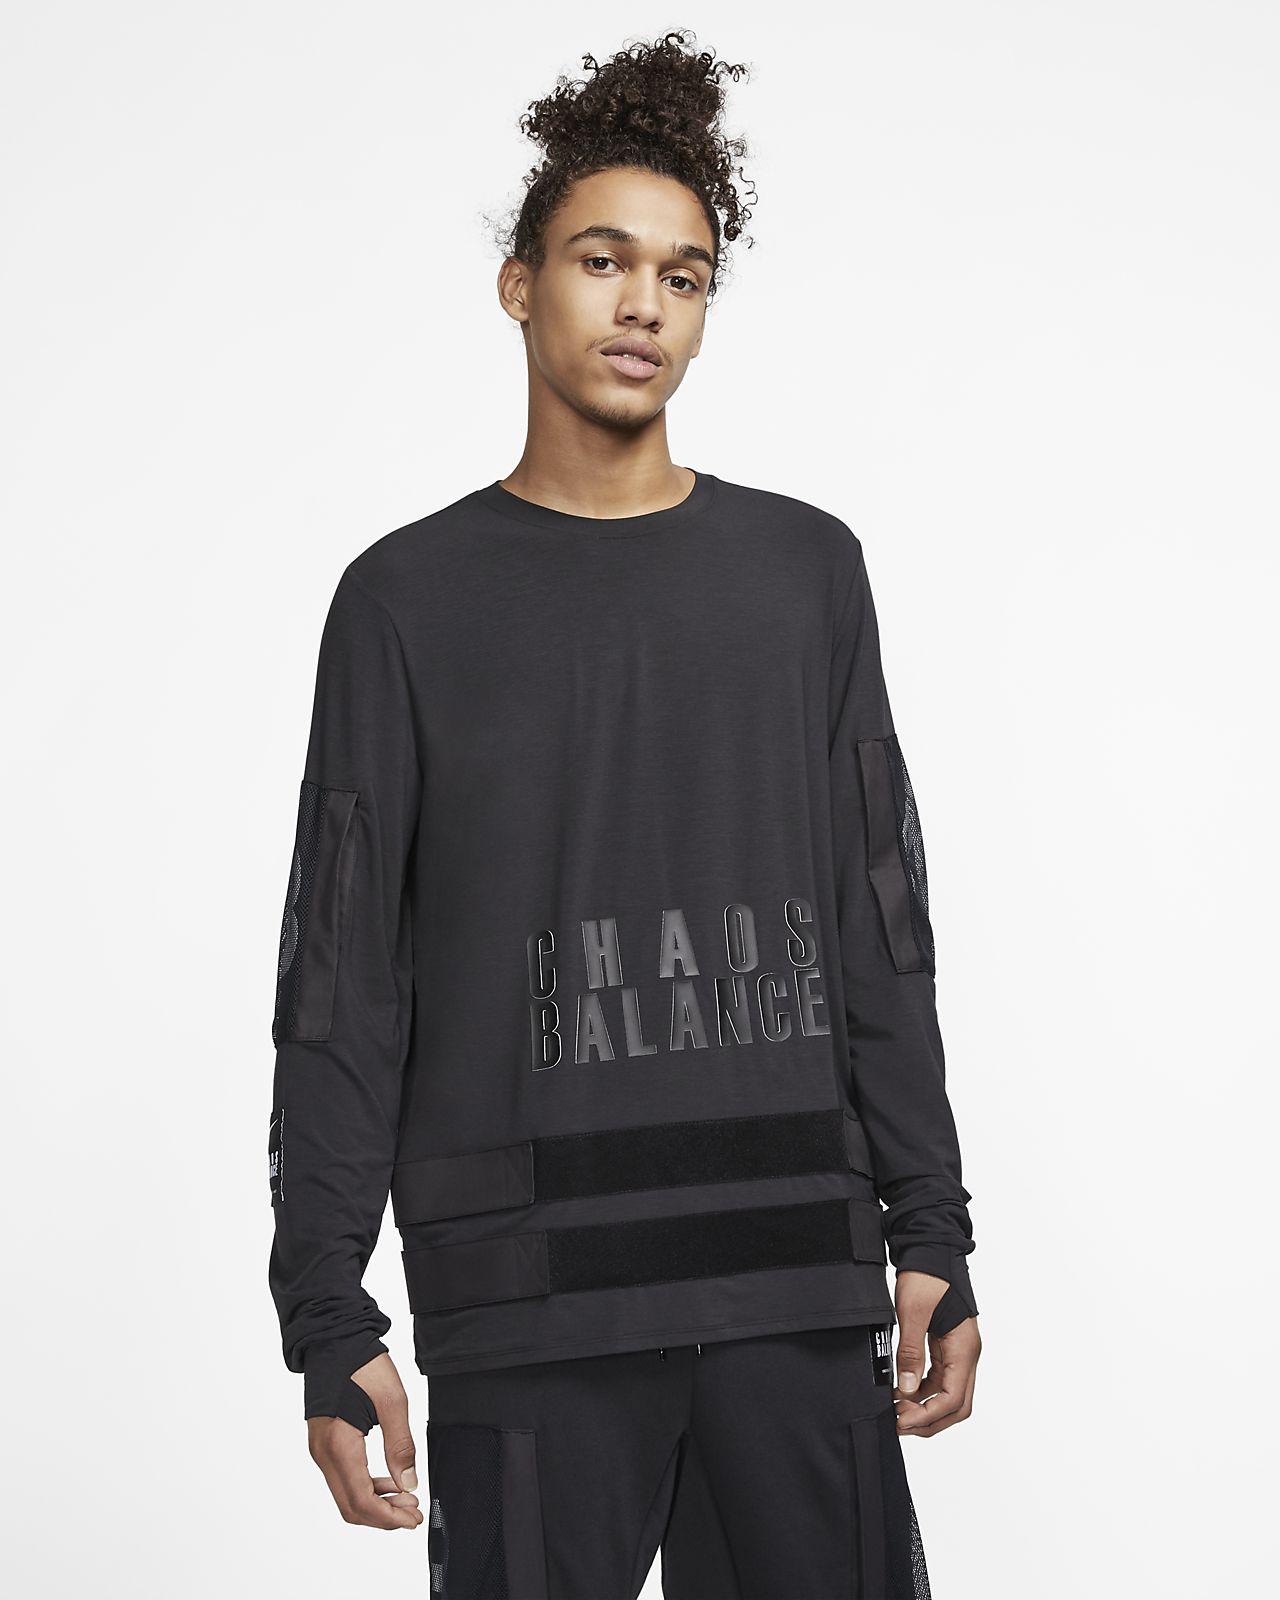 Nike x Undercover Camiseta de manga larga - Hombre